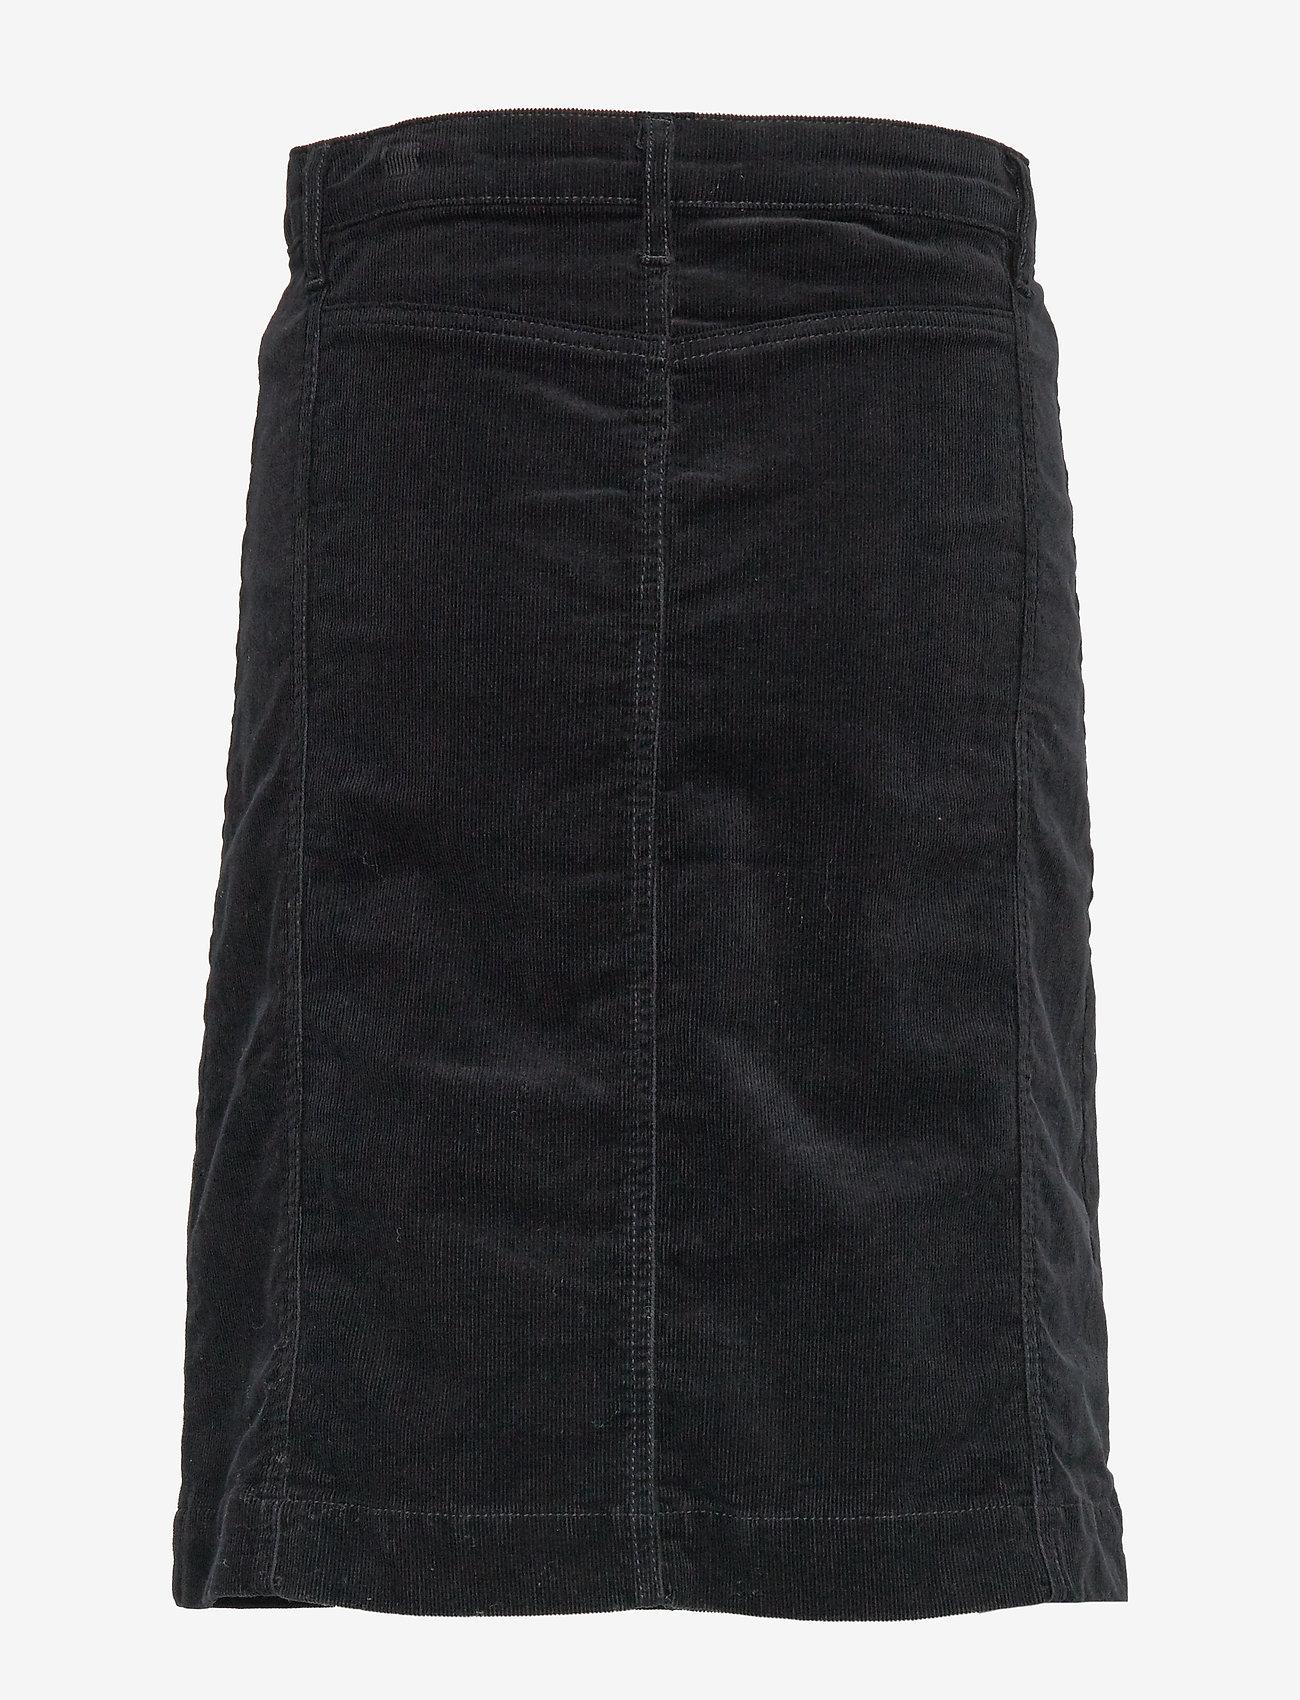 Soyaconcept - SC-BAILEY - jupes courtes - black